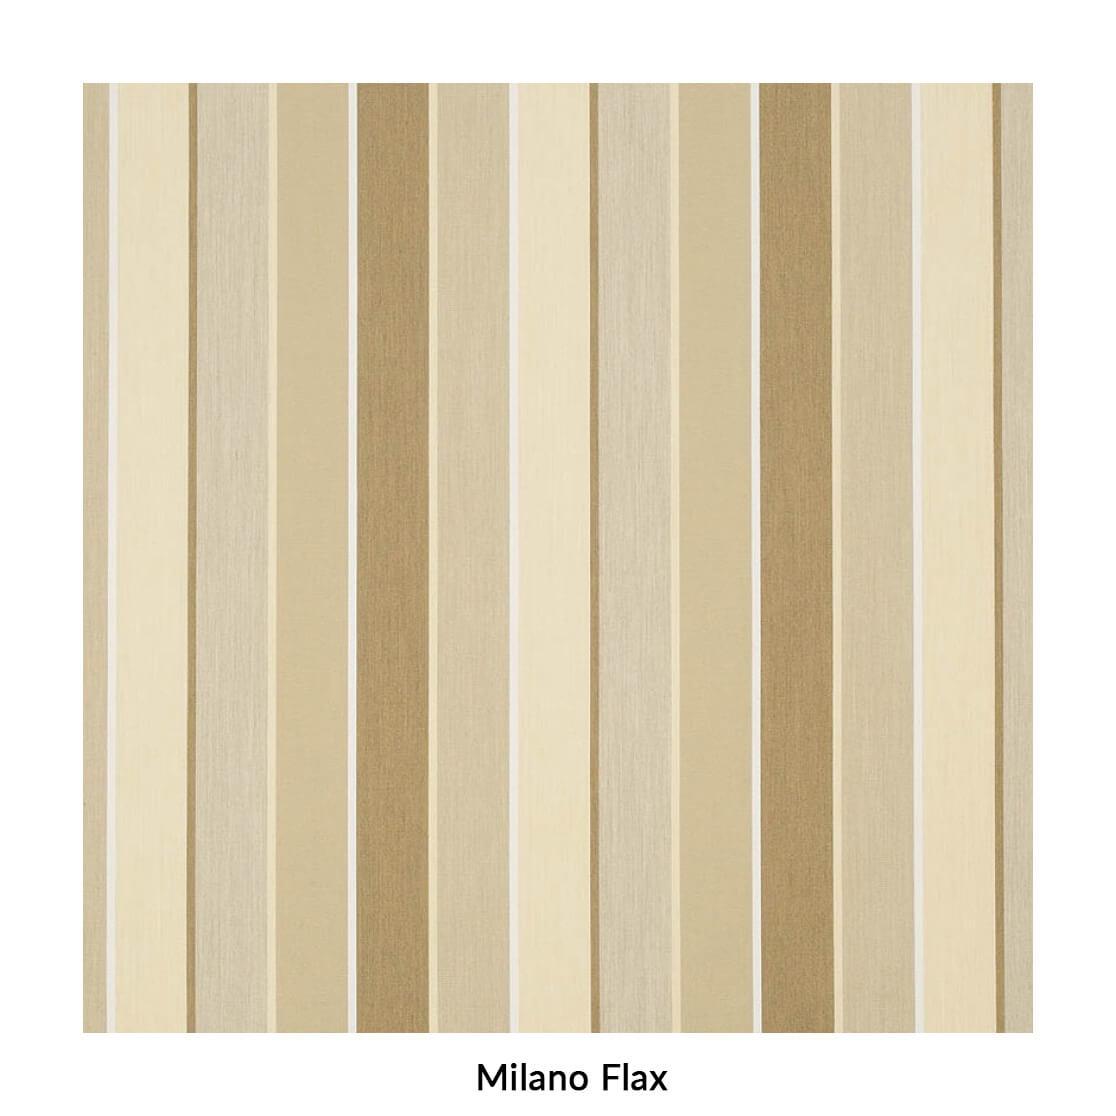 milano-flax.jpg